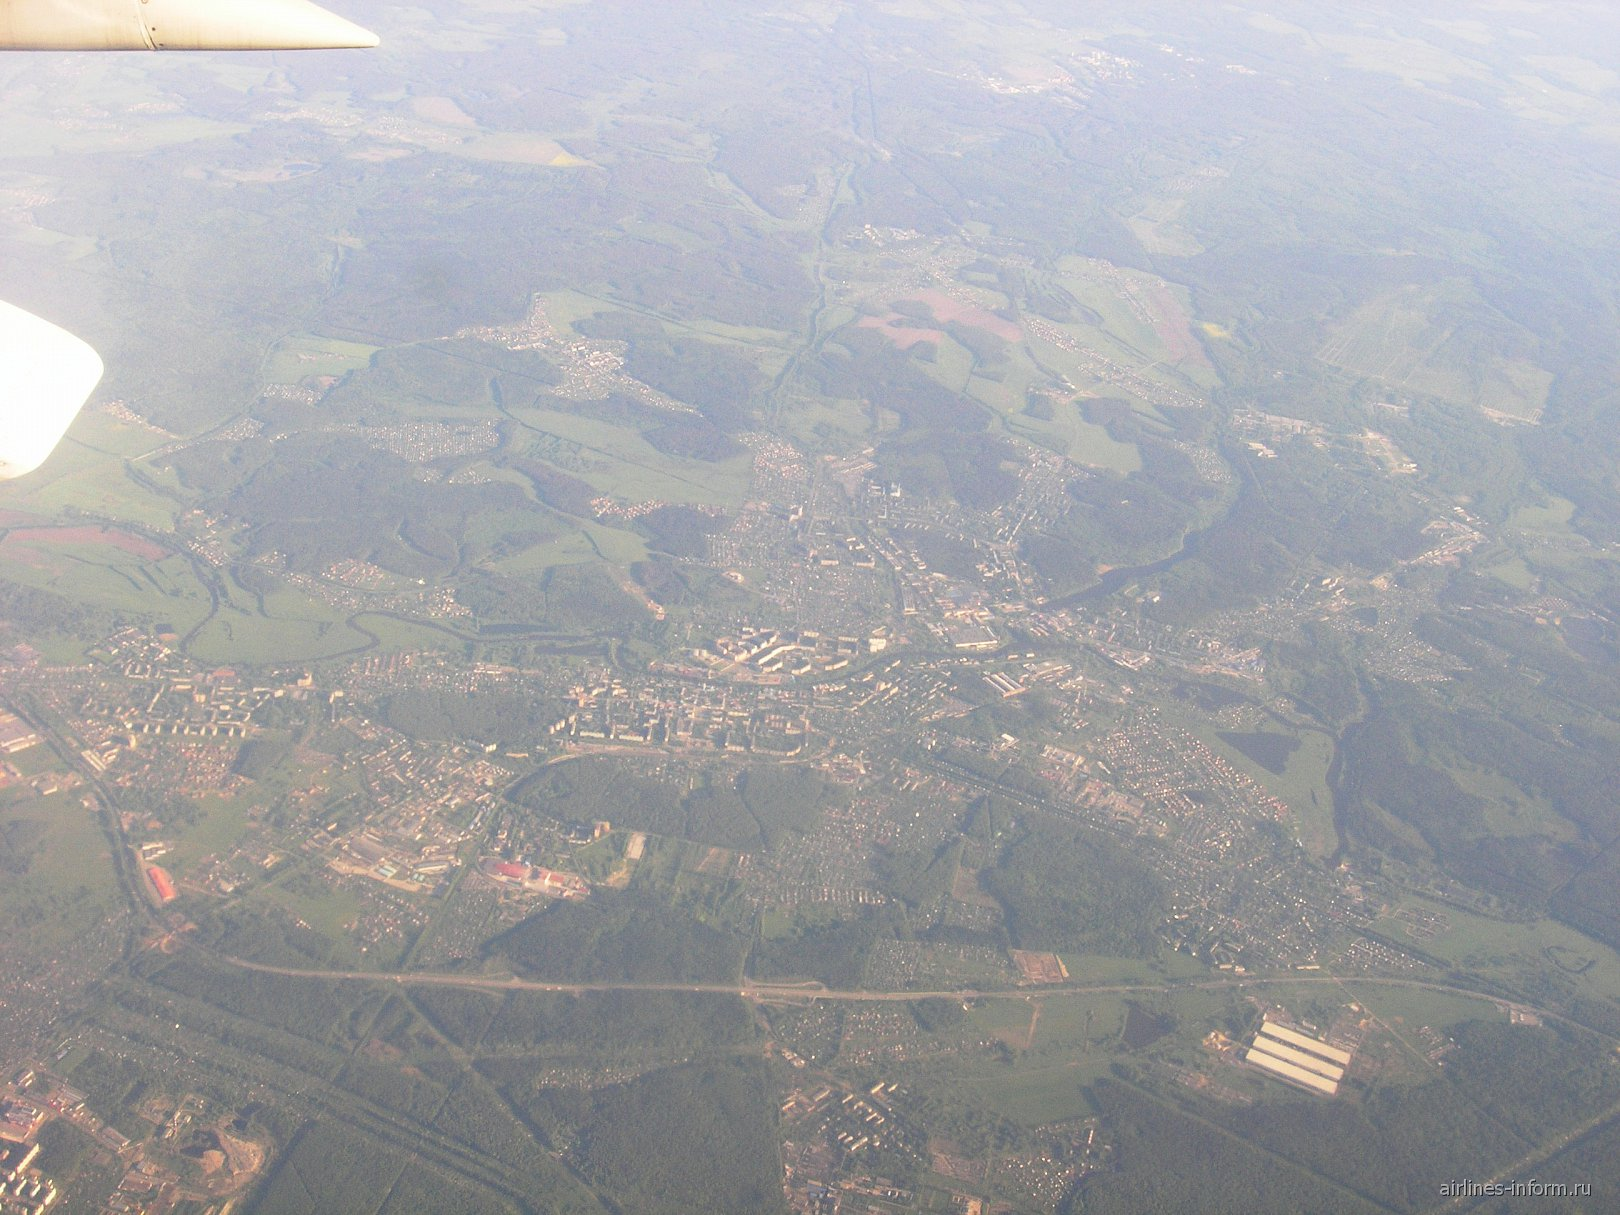 Вид из самолета на город Ногинск